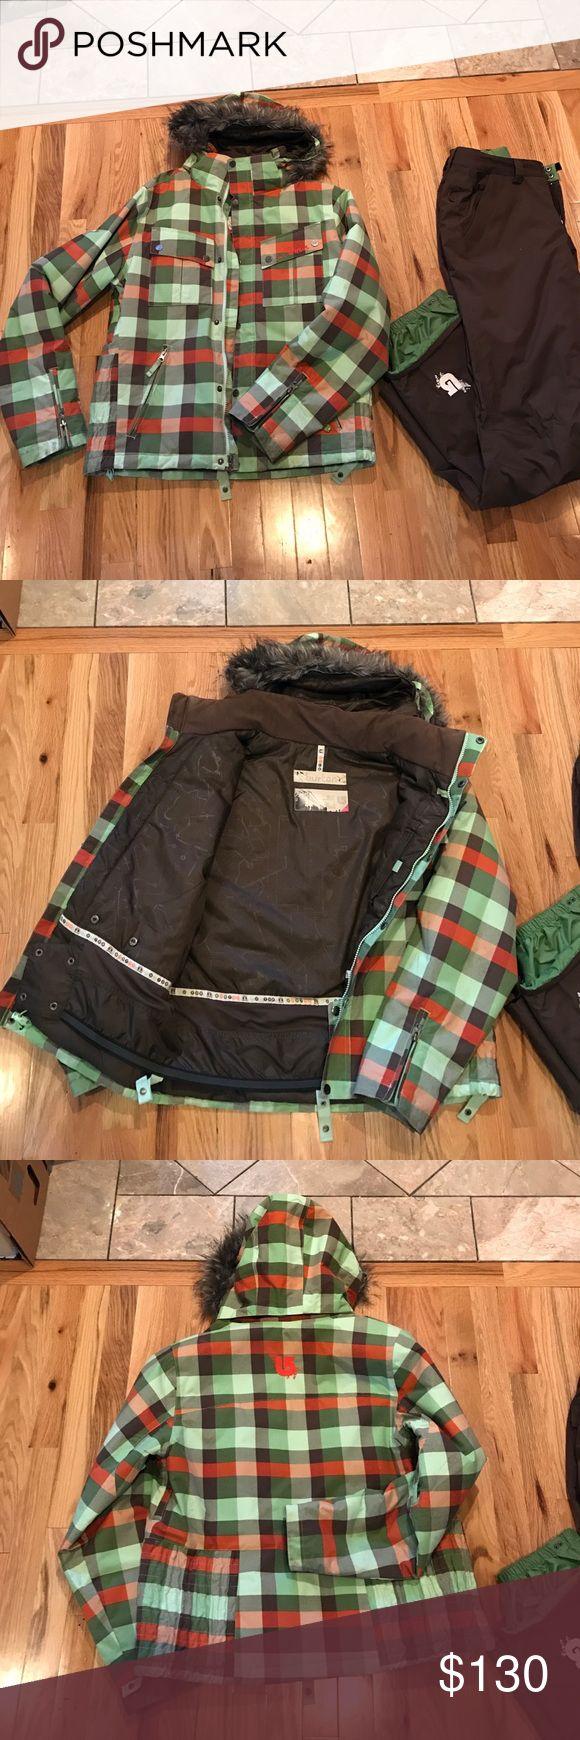 Burton ski and snow pant Green and orange checkered Burton ski jacket and brown Burton Ski pants. Large jacket and Medium pant. Good condition -  small rip at bottom of pants. Detachable faux fur and detachable hood. Burton Other